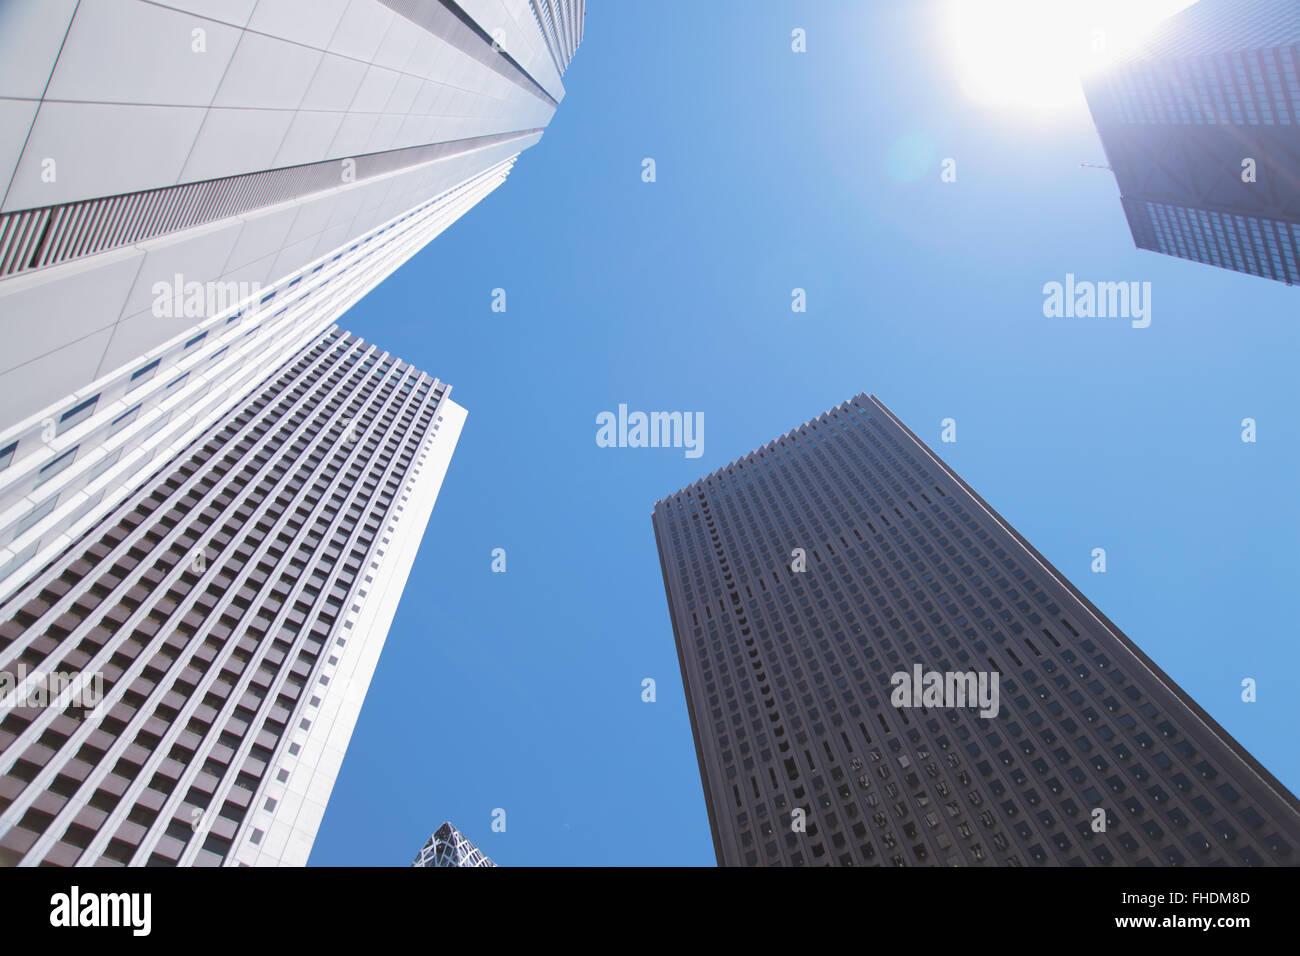 Office buidings in Shinjuku district, Tokyo, Japan - Stock Image